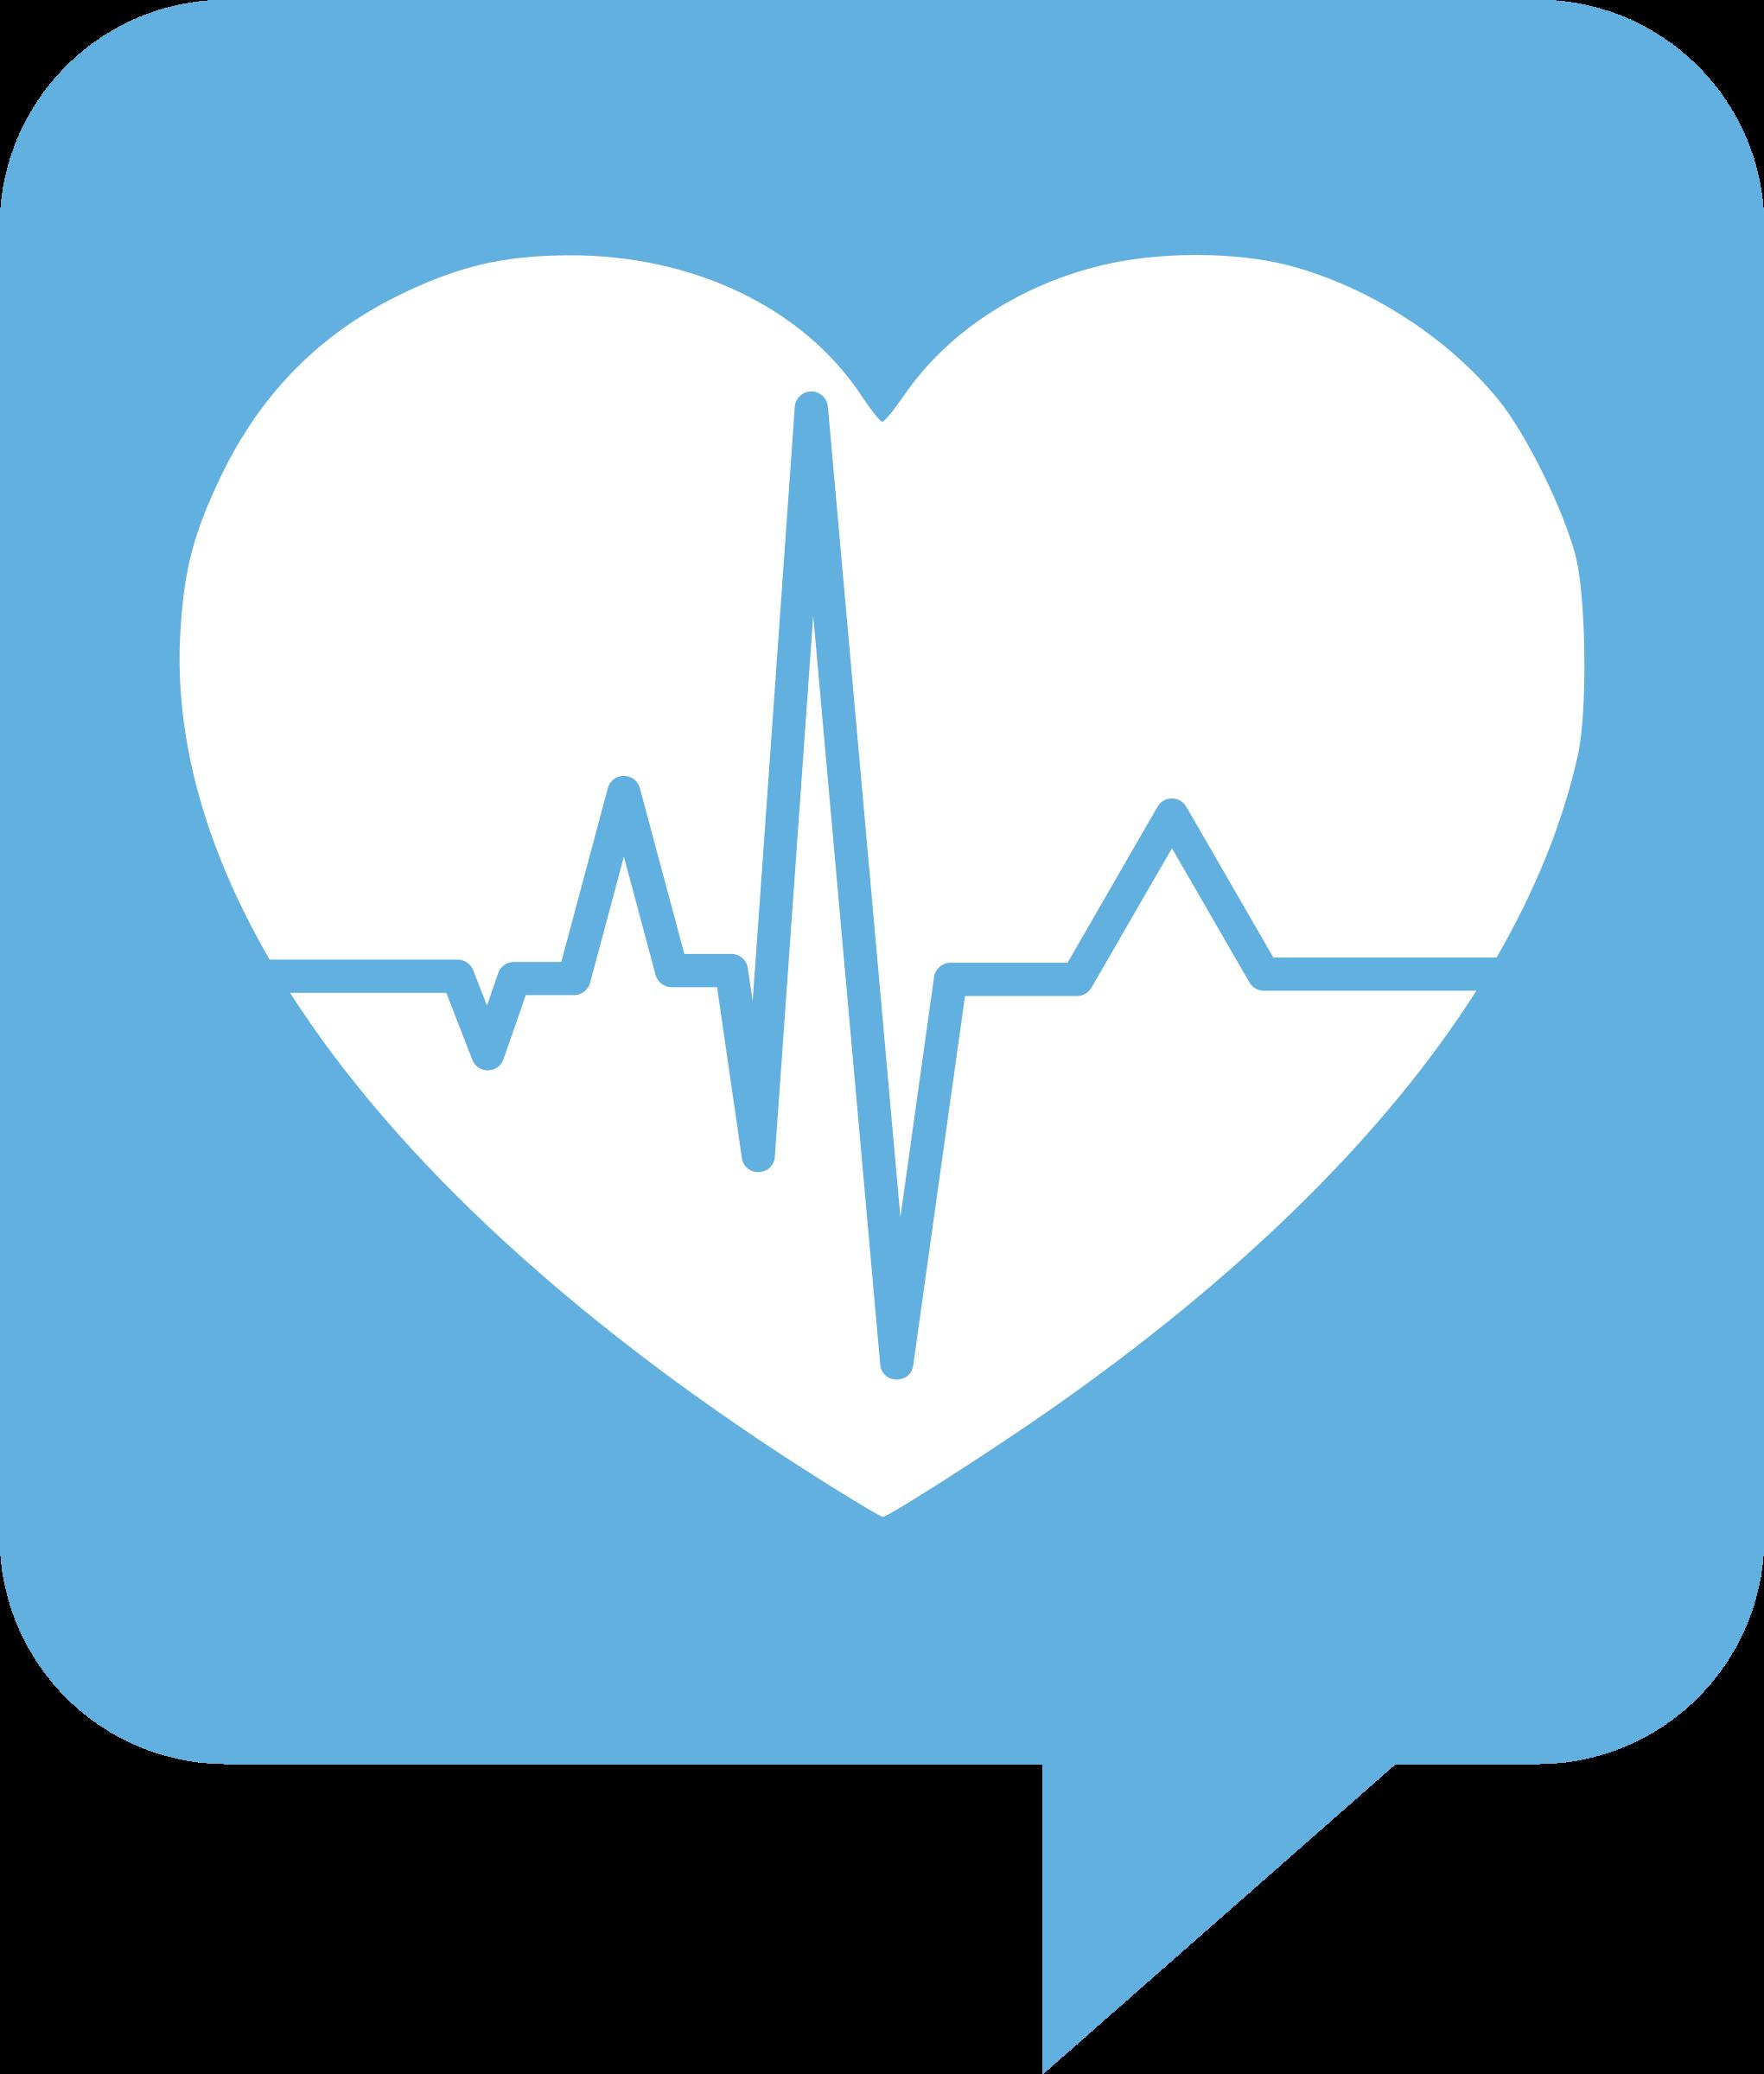 free stock Heartbeat clipart. Logo for health se